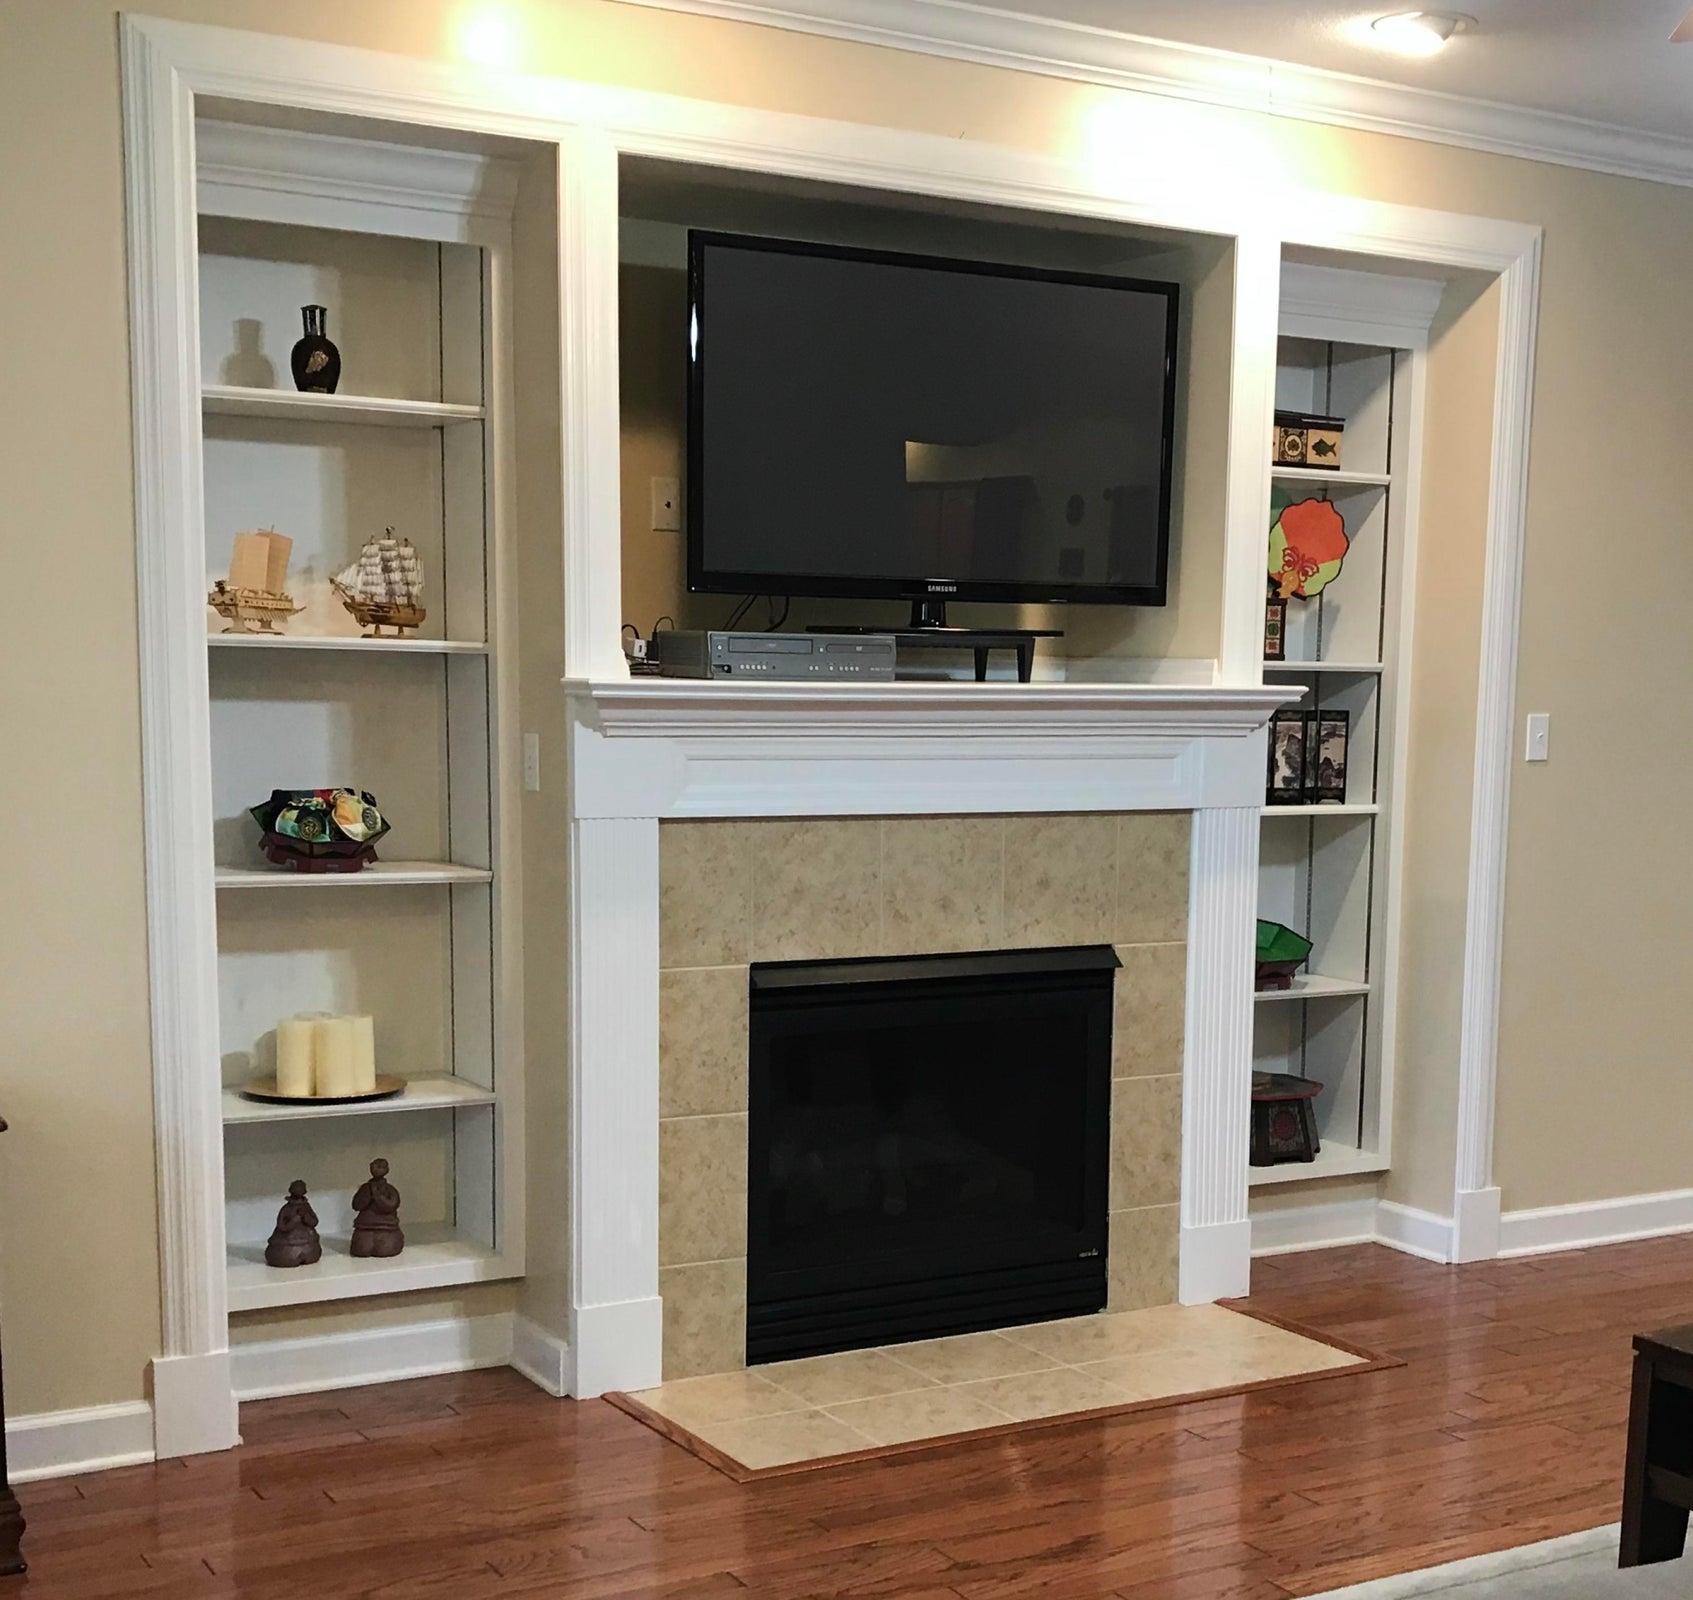 Fireplace w/ Built-Ins